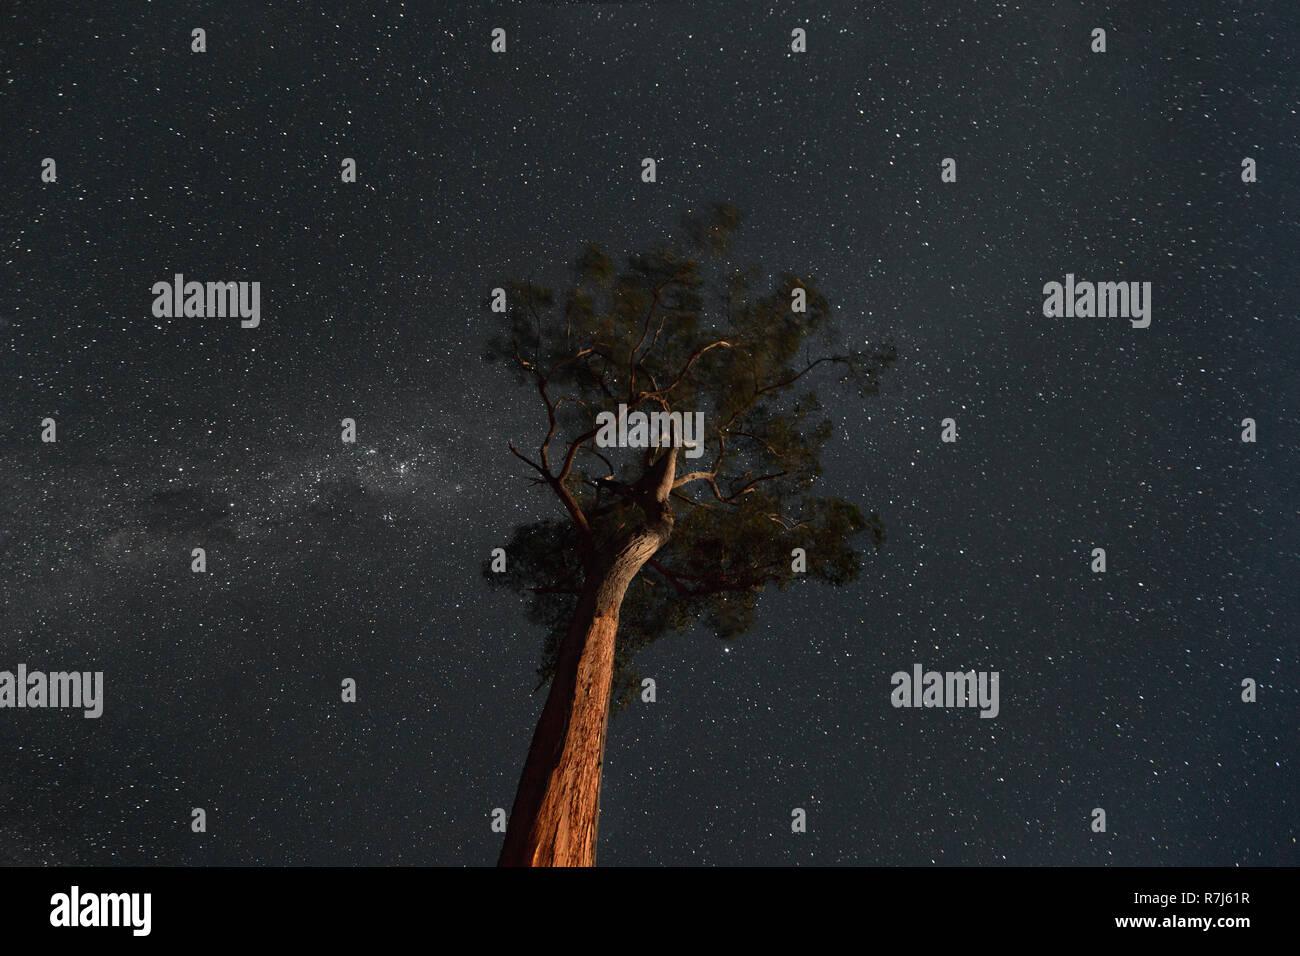 Star light on clear night around illuminated forest tree. - Stock Image